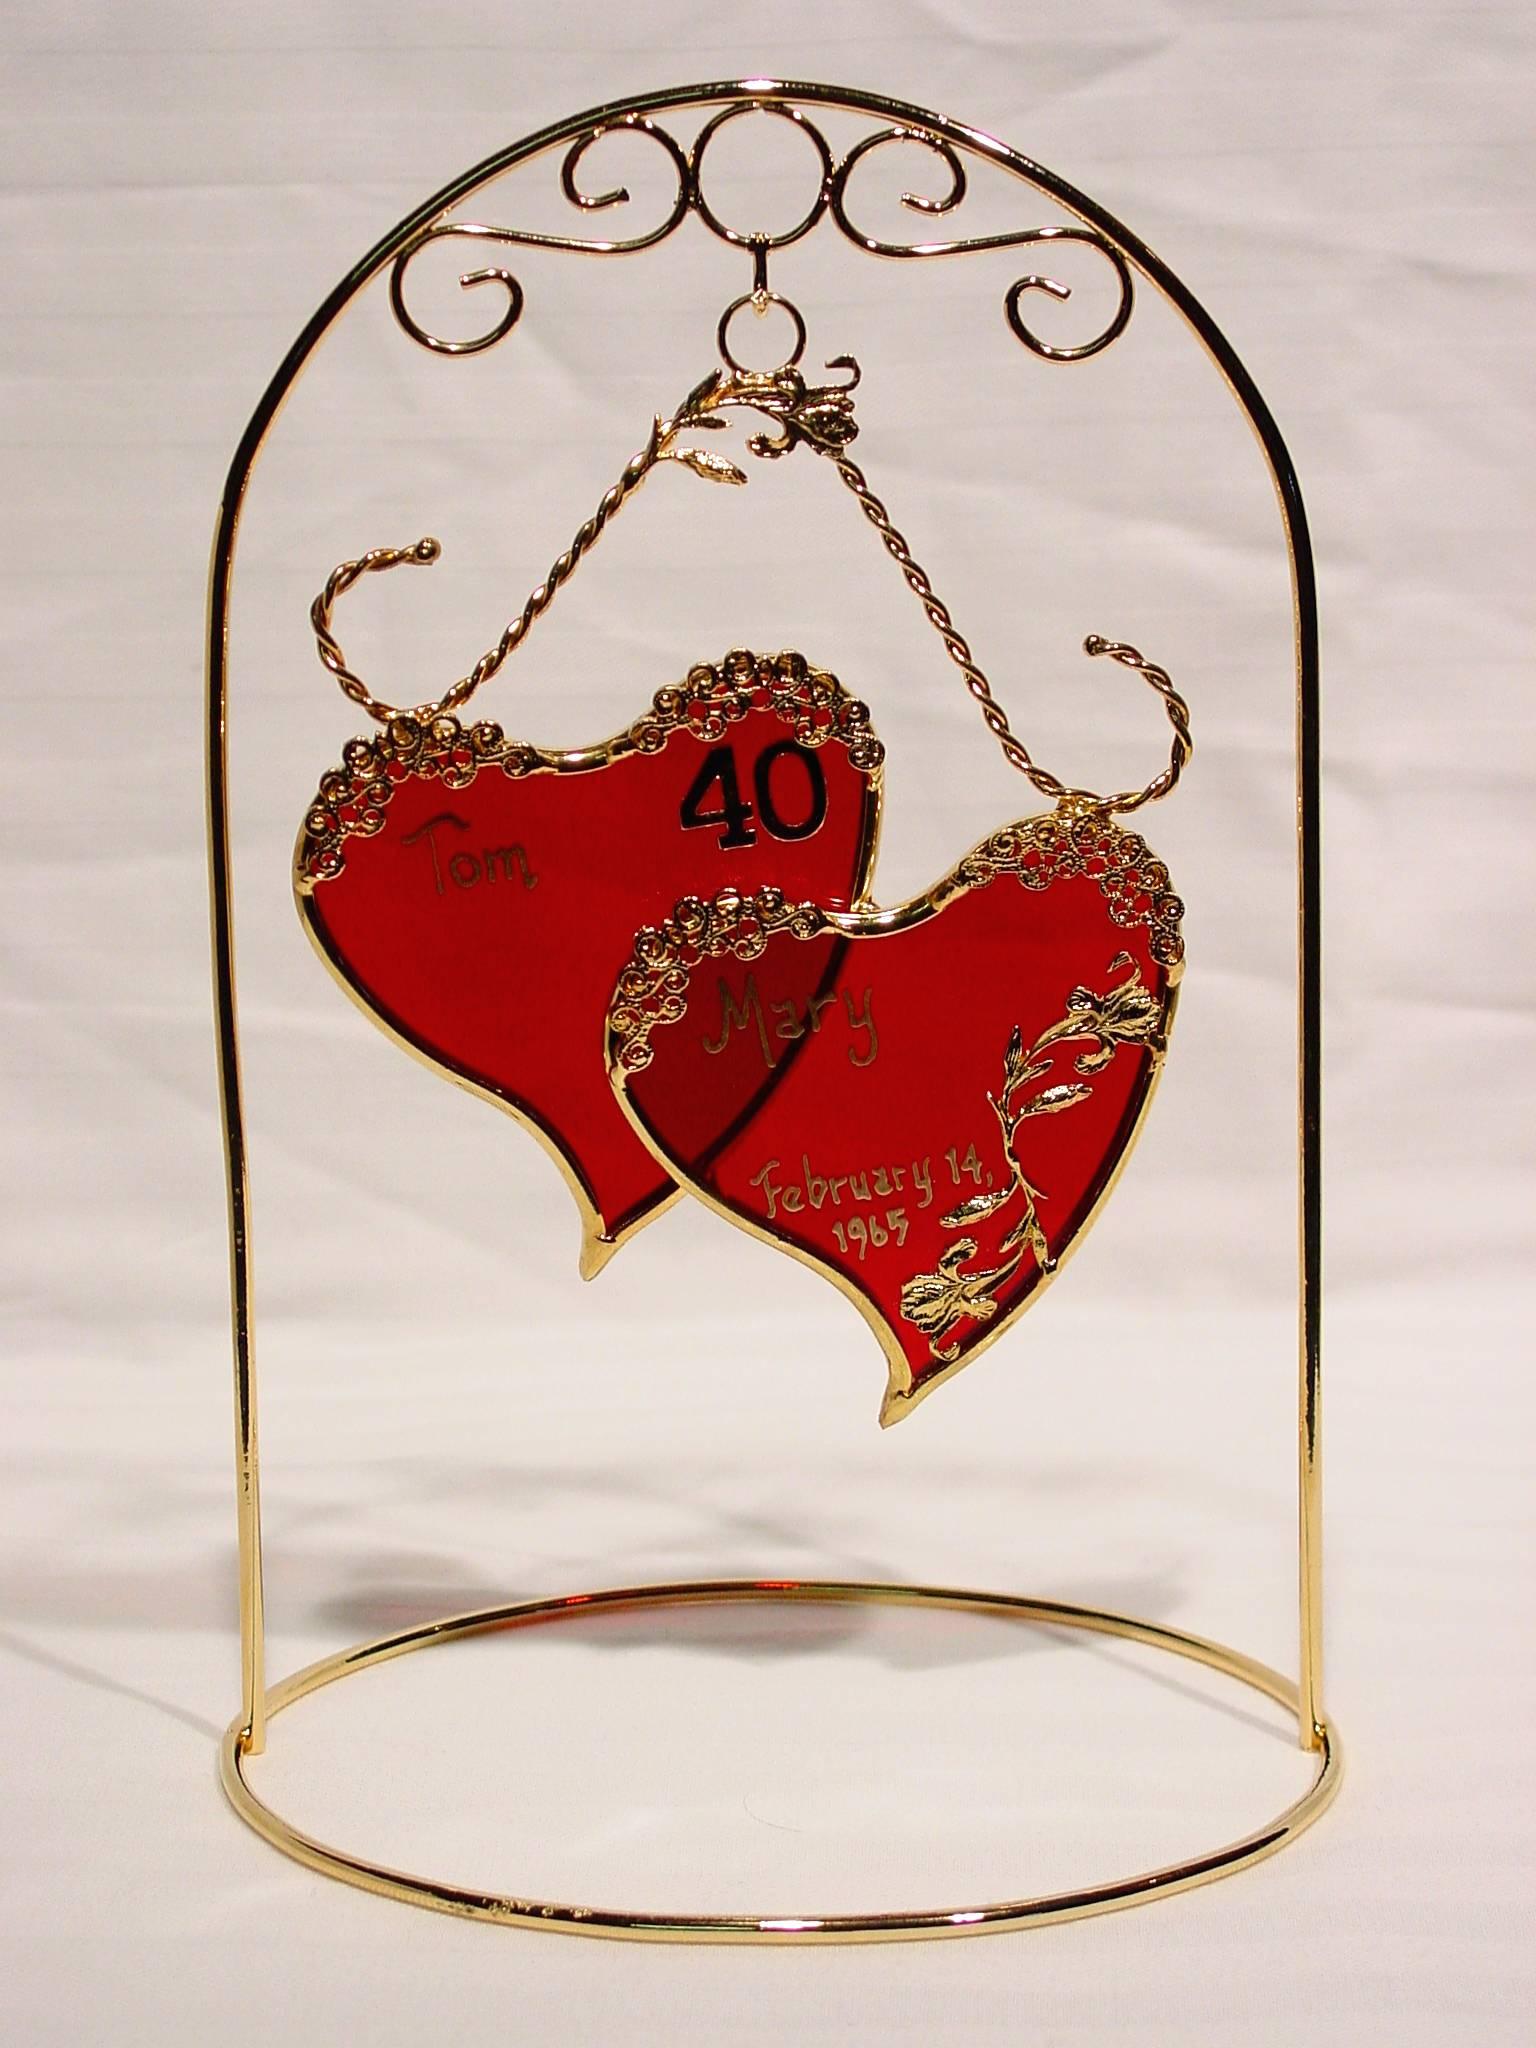 juhlin 40th wedding anniversary gift Personalized Wedding Anniversary Sweetheart Gifts